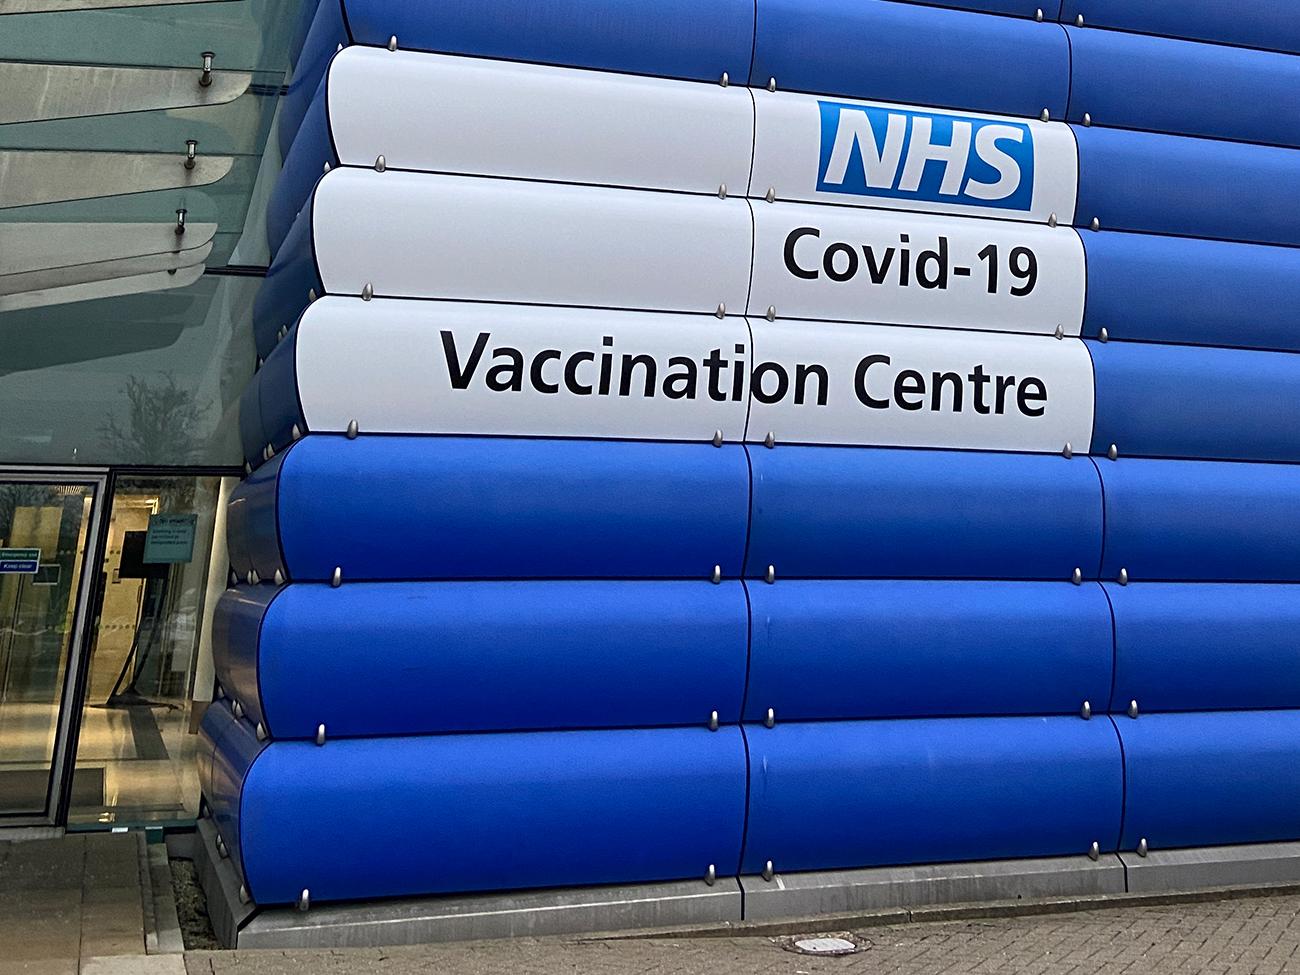 NHS Vaccination Centre Destination Branding